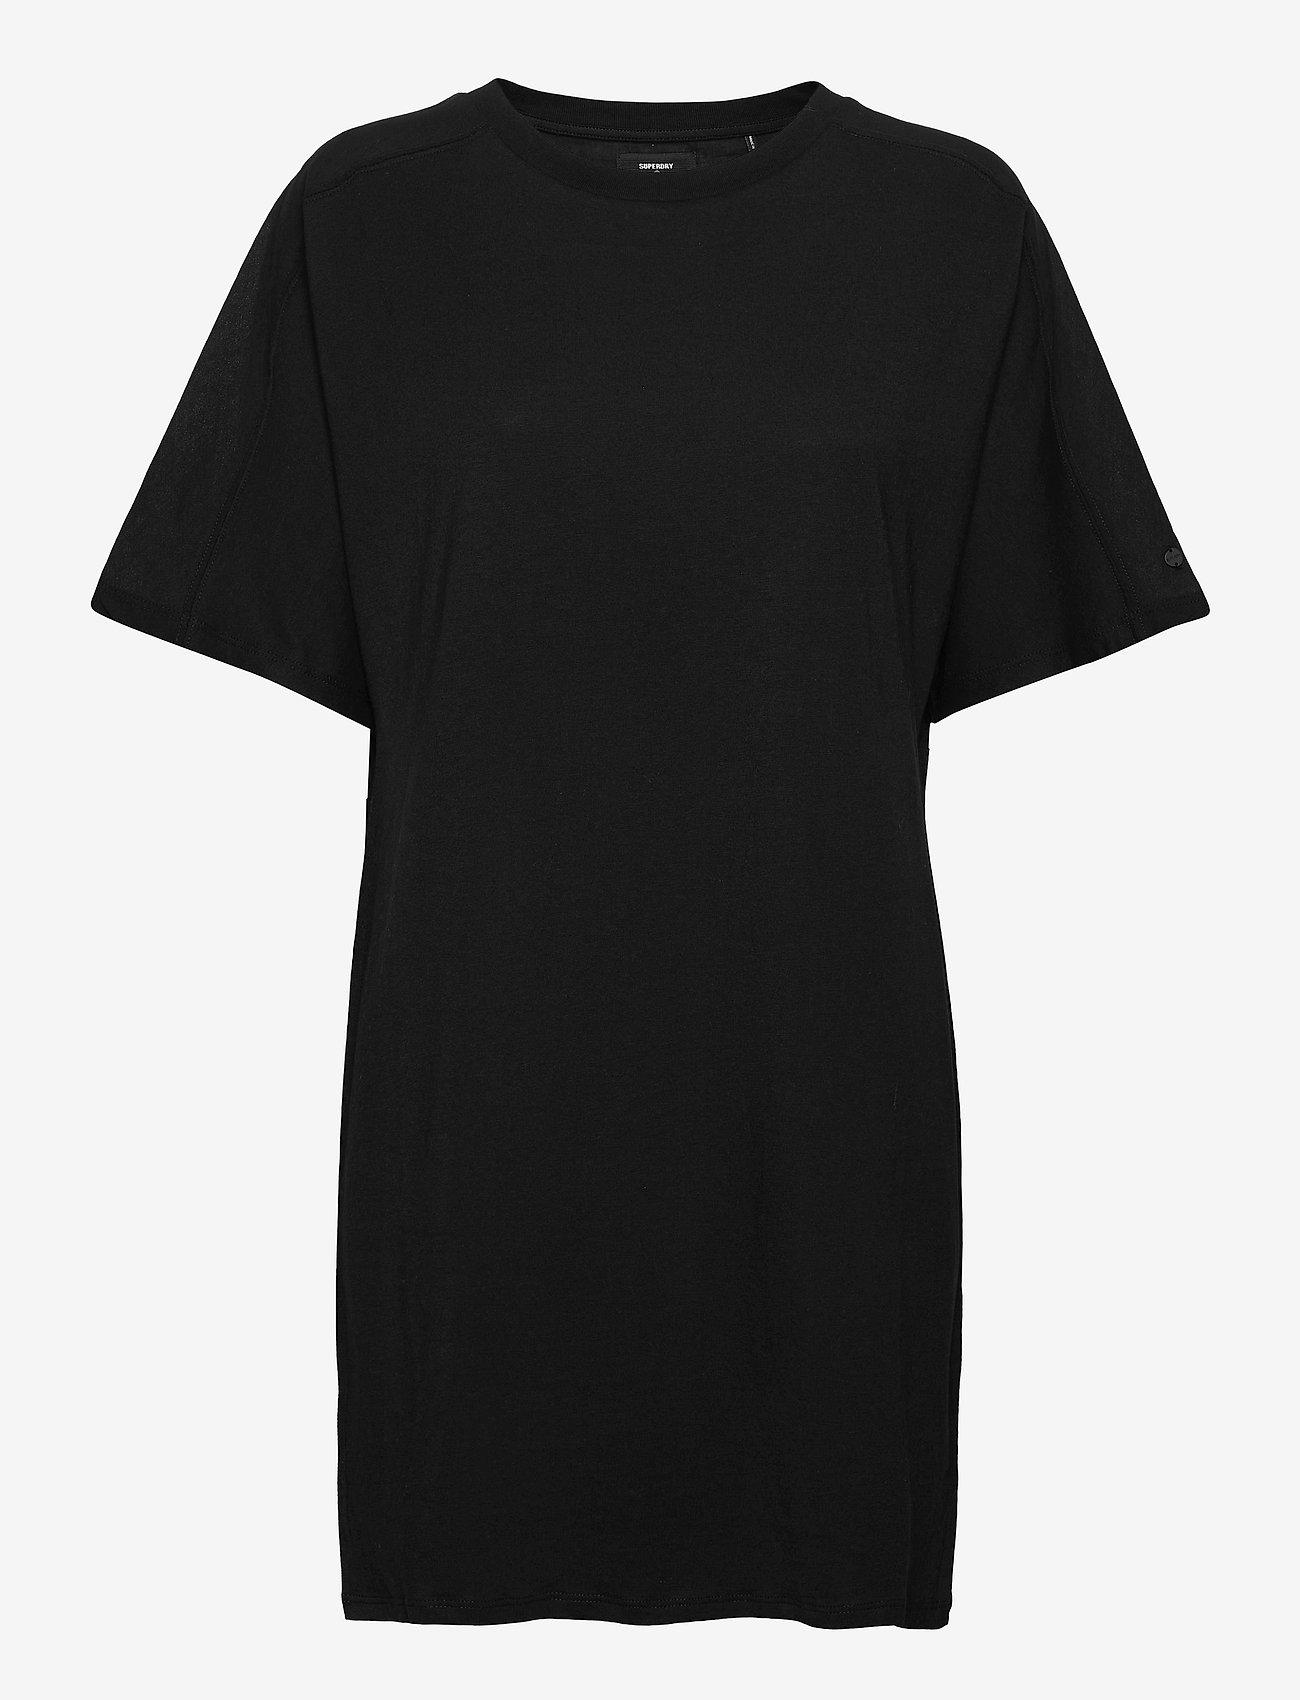 Superdry - COTTON MODAL TSHIRT DRESS - summer dresses - black - 0